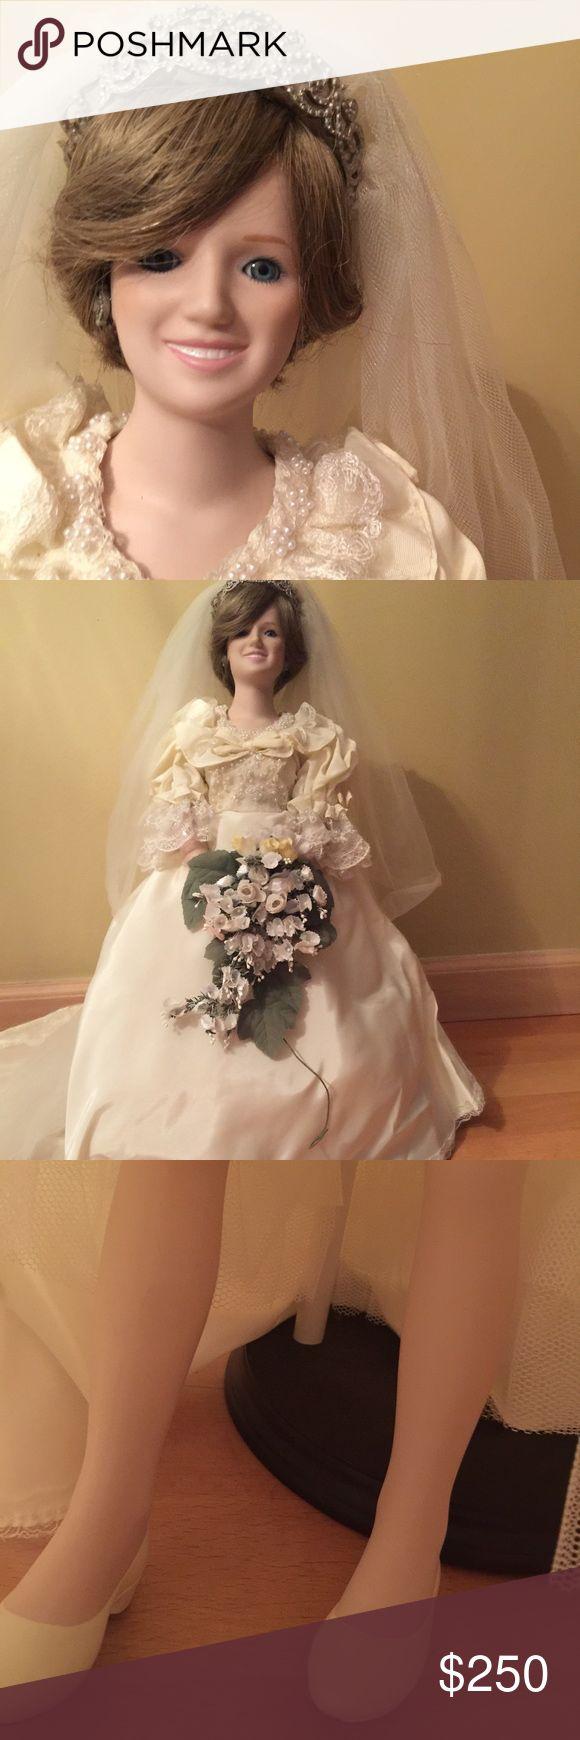 princess diana doll in wedding dress » Wedding Dresses Designs ...